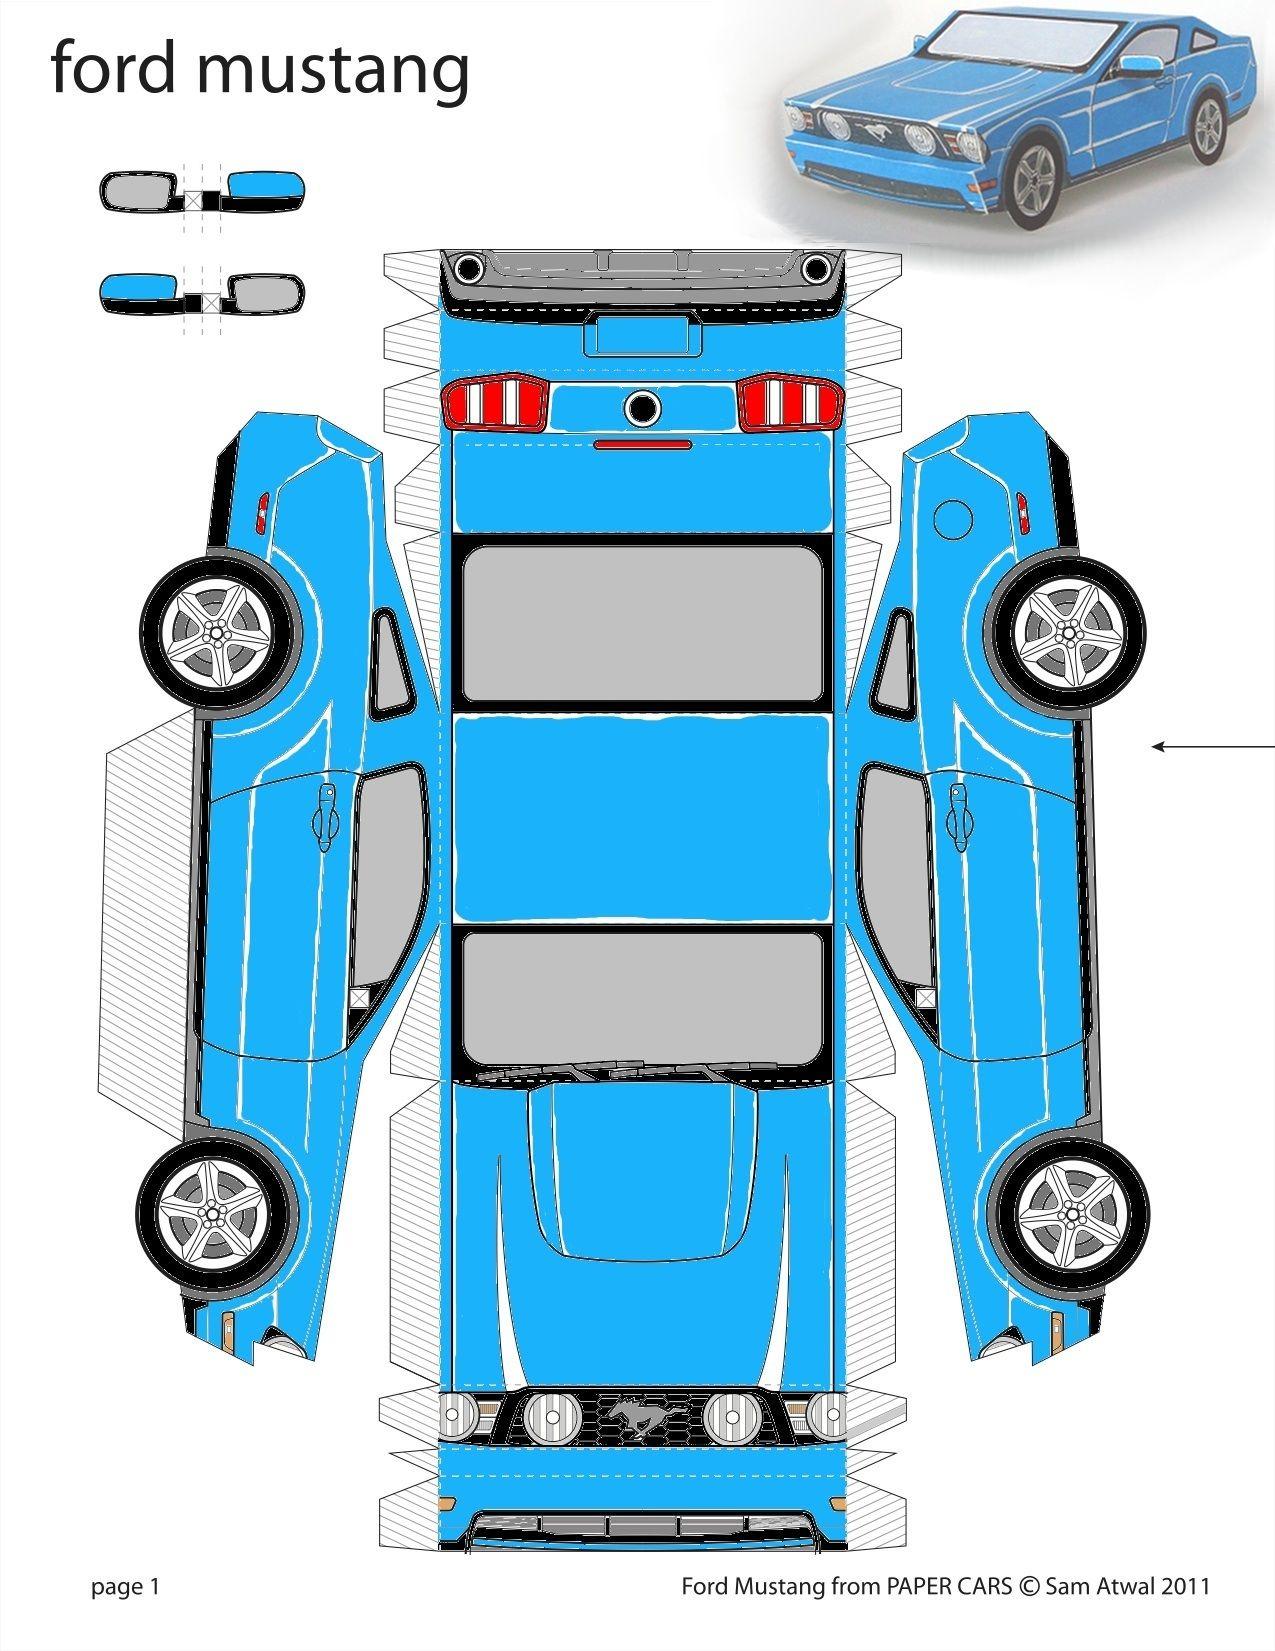 paper cars template - Emayti australianuniversities co